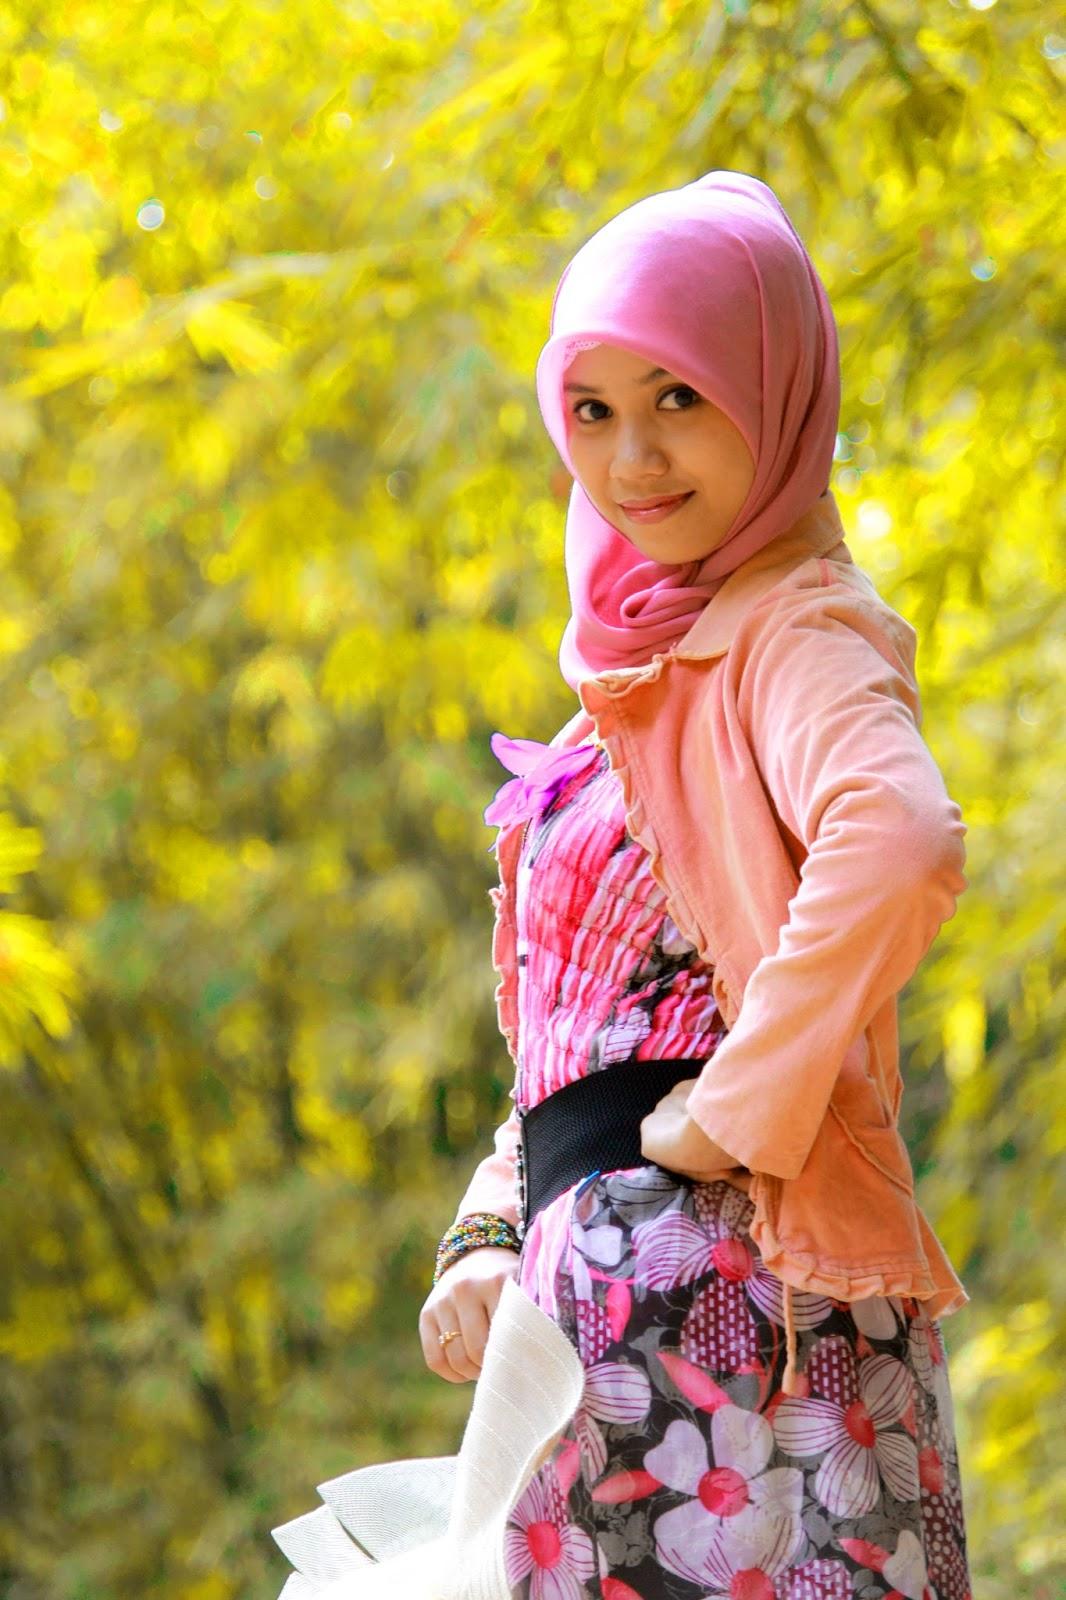 model hijab makassar manis dan seksi Hani A.K.A Nirmalasari di Pulau Lakkang Makassar mahasiswi UNM dari Suku Bugis Bone